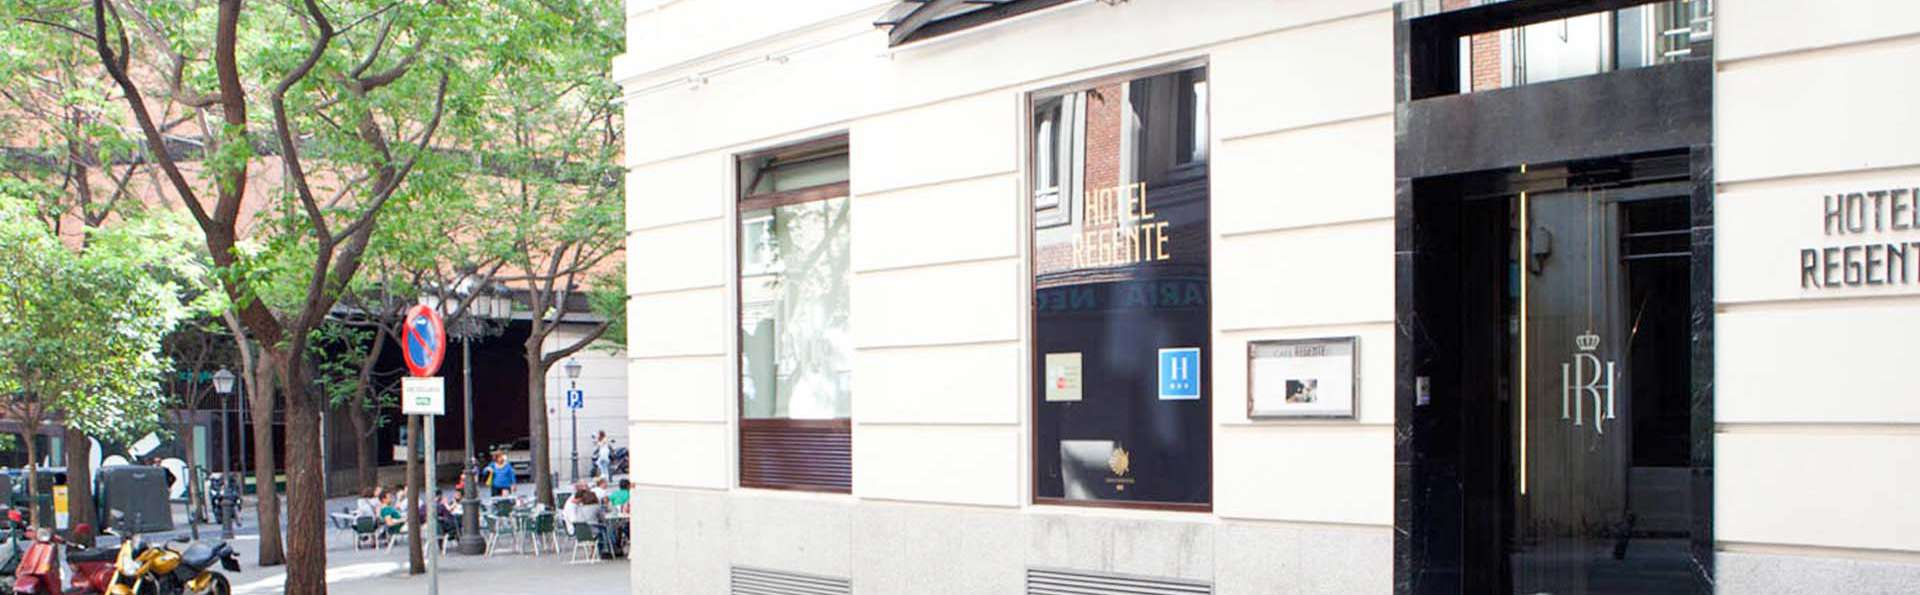 Hotel Regente - EDIT_FRONT_01.jpg